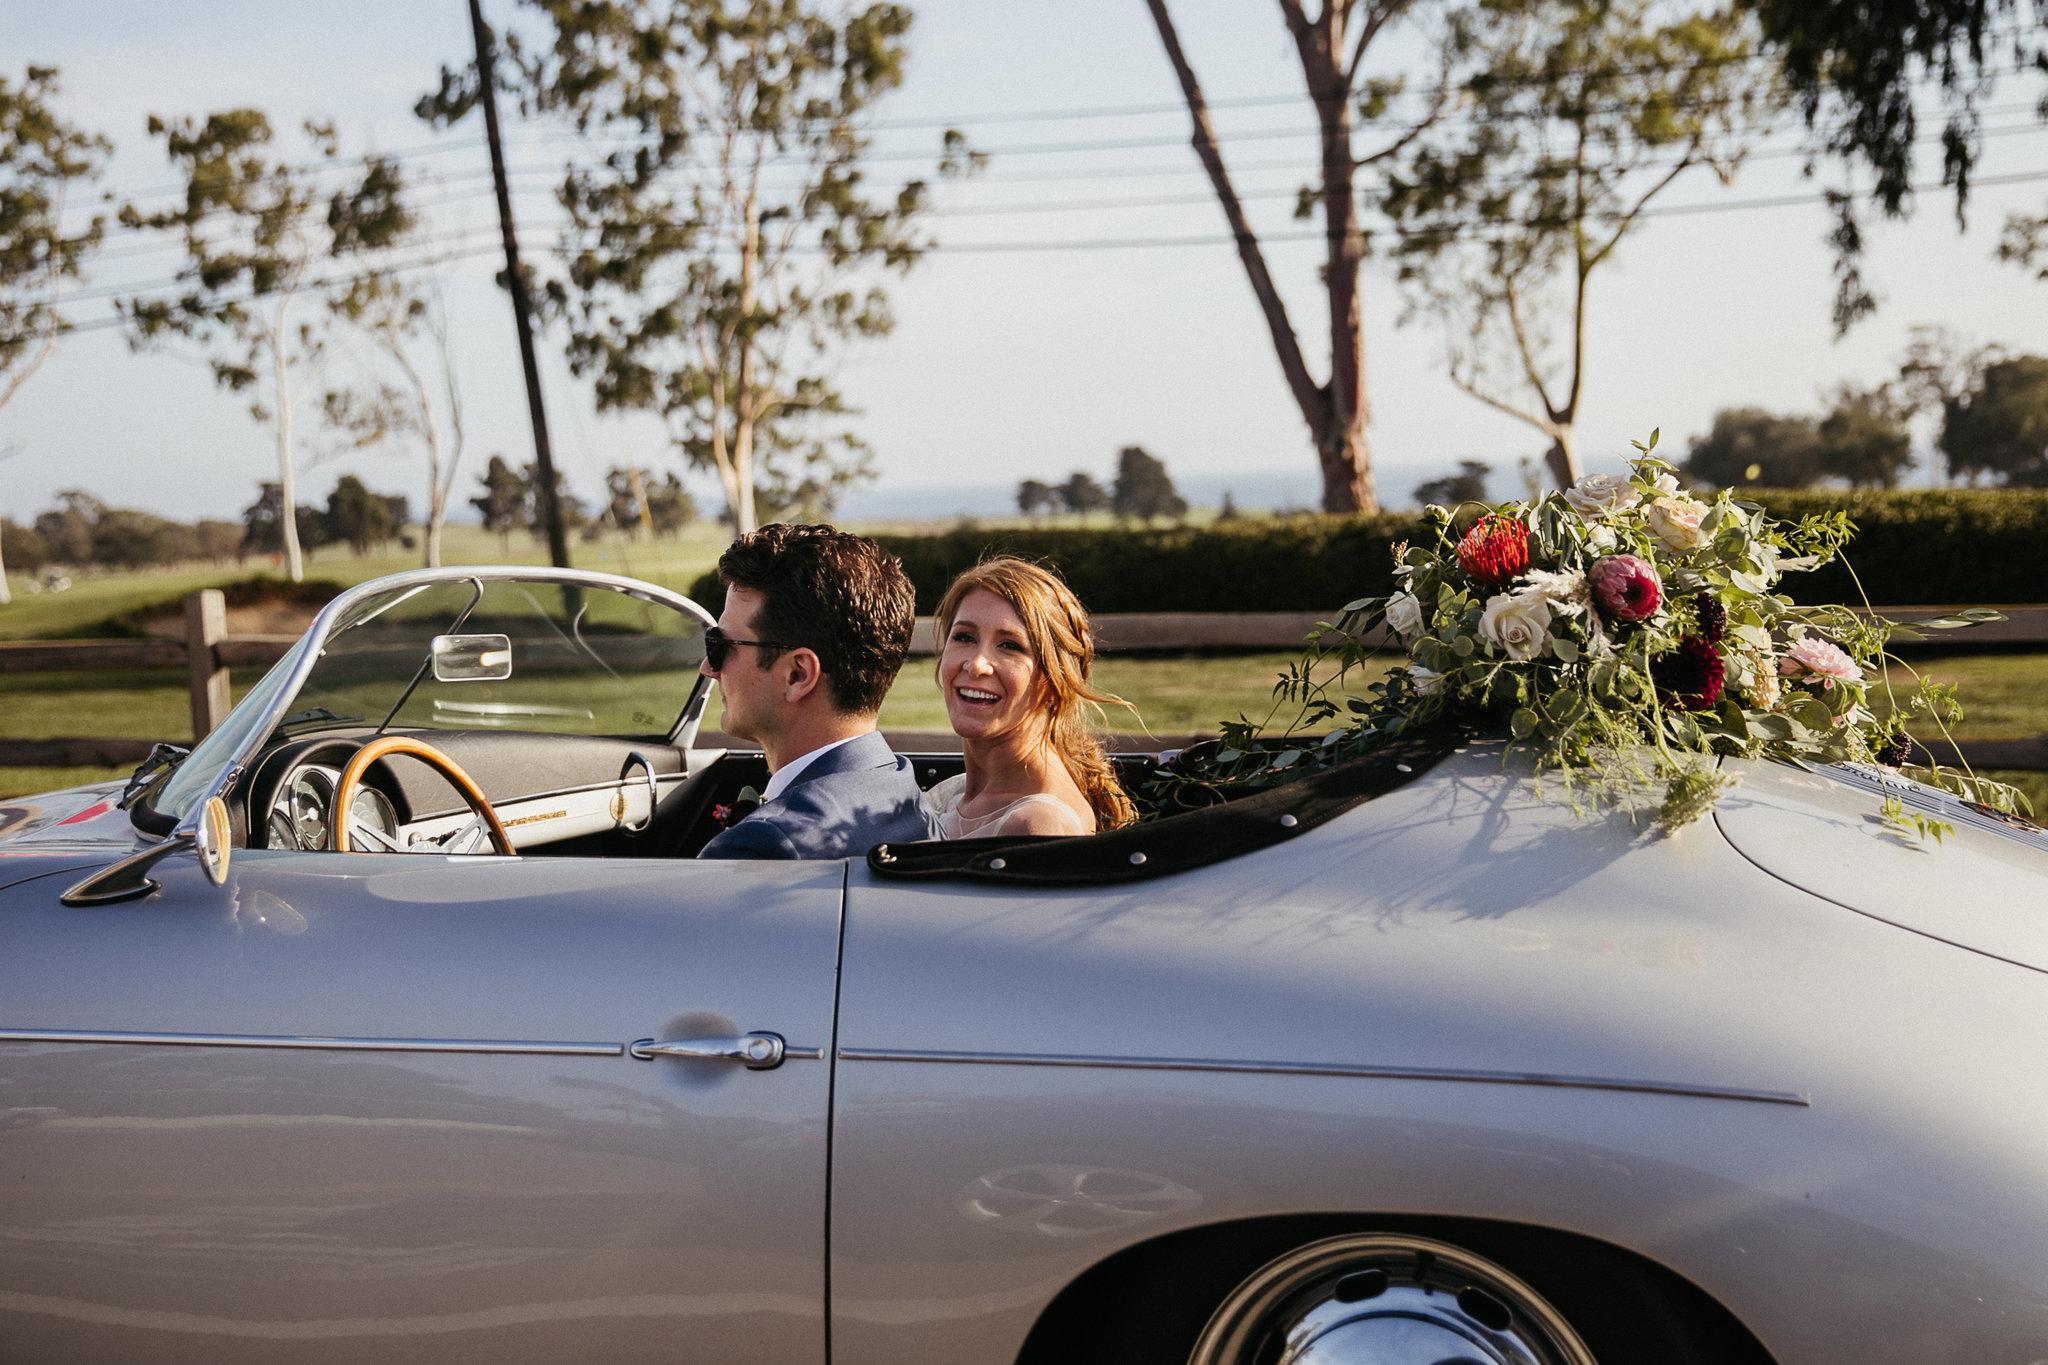 santa-barbara-elopement-wedding-planner-planning-coordinator-day-of-ellwood-bluff-ocean-front-view-bacara-resort-ritz-carlton-porsche-downtown (13).jpg